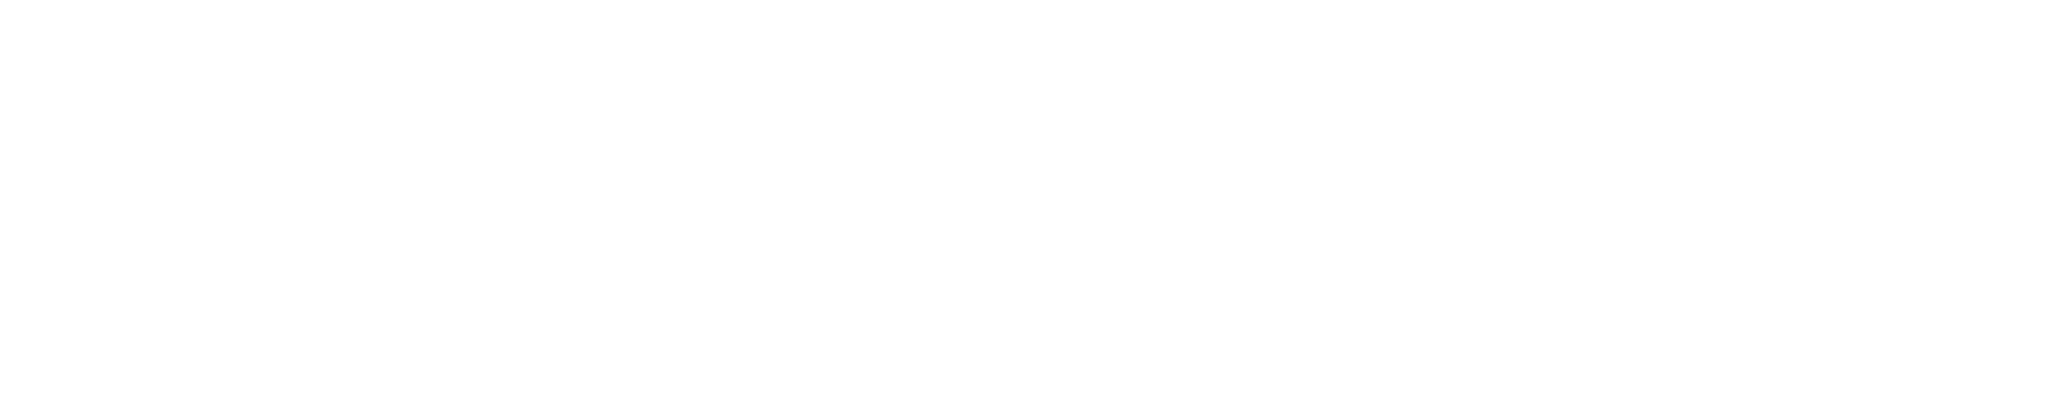 Electrify Expo Plumm bike logo